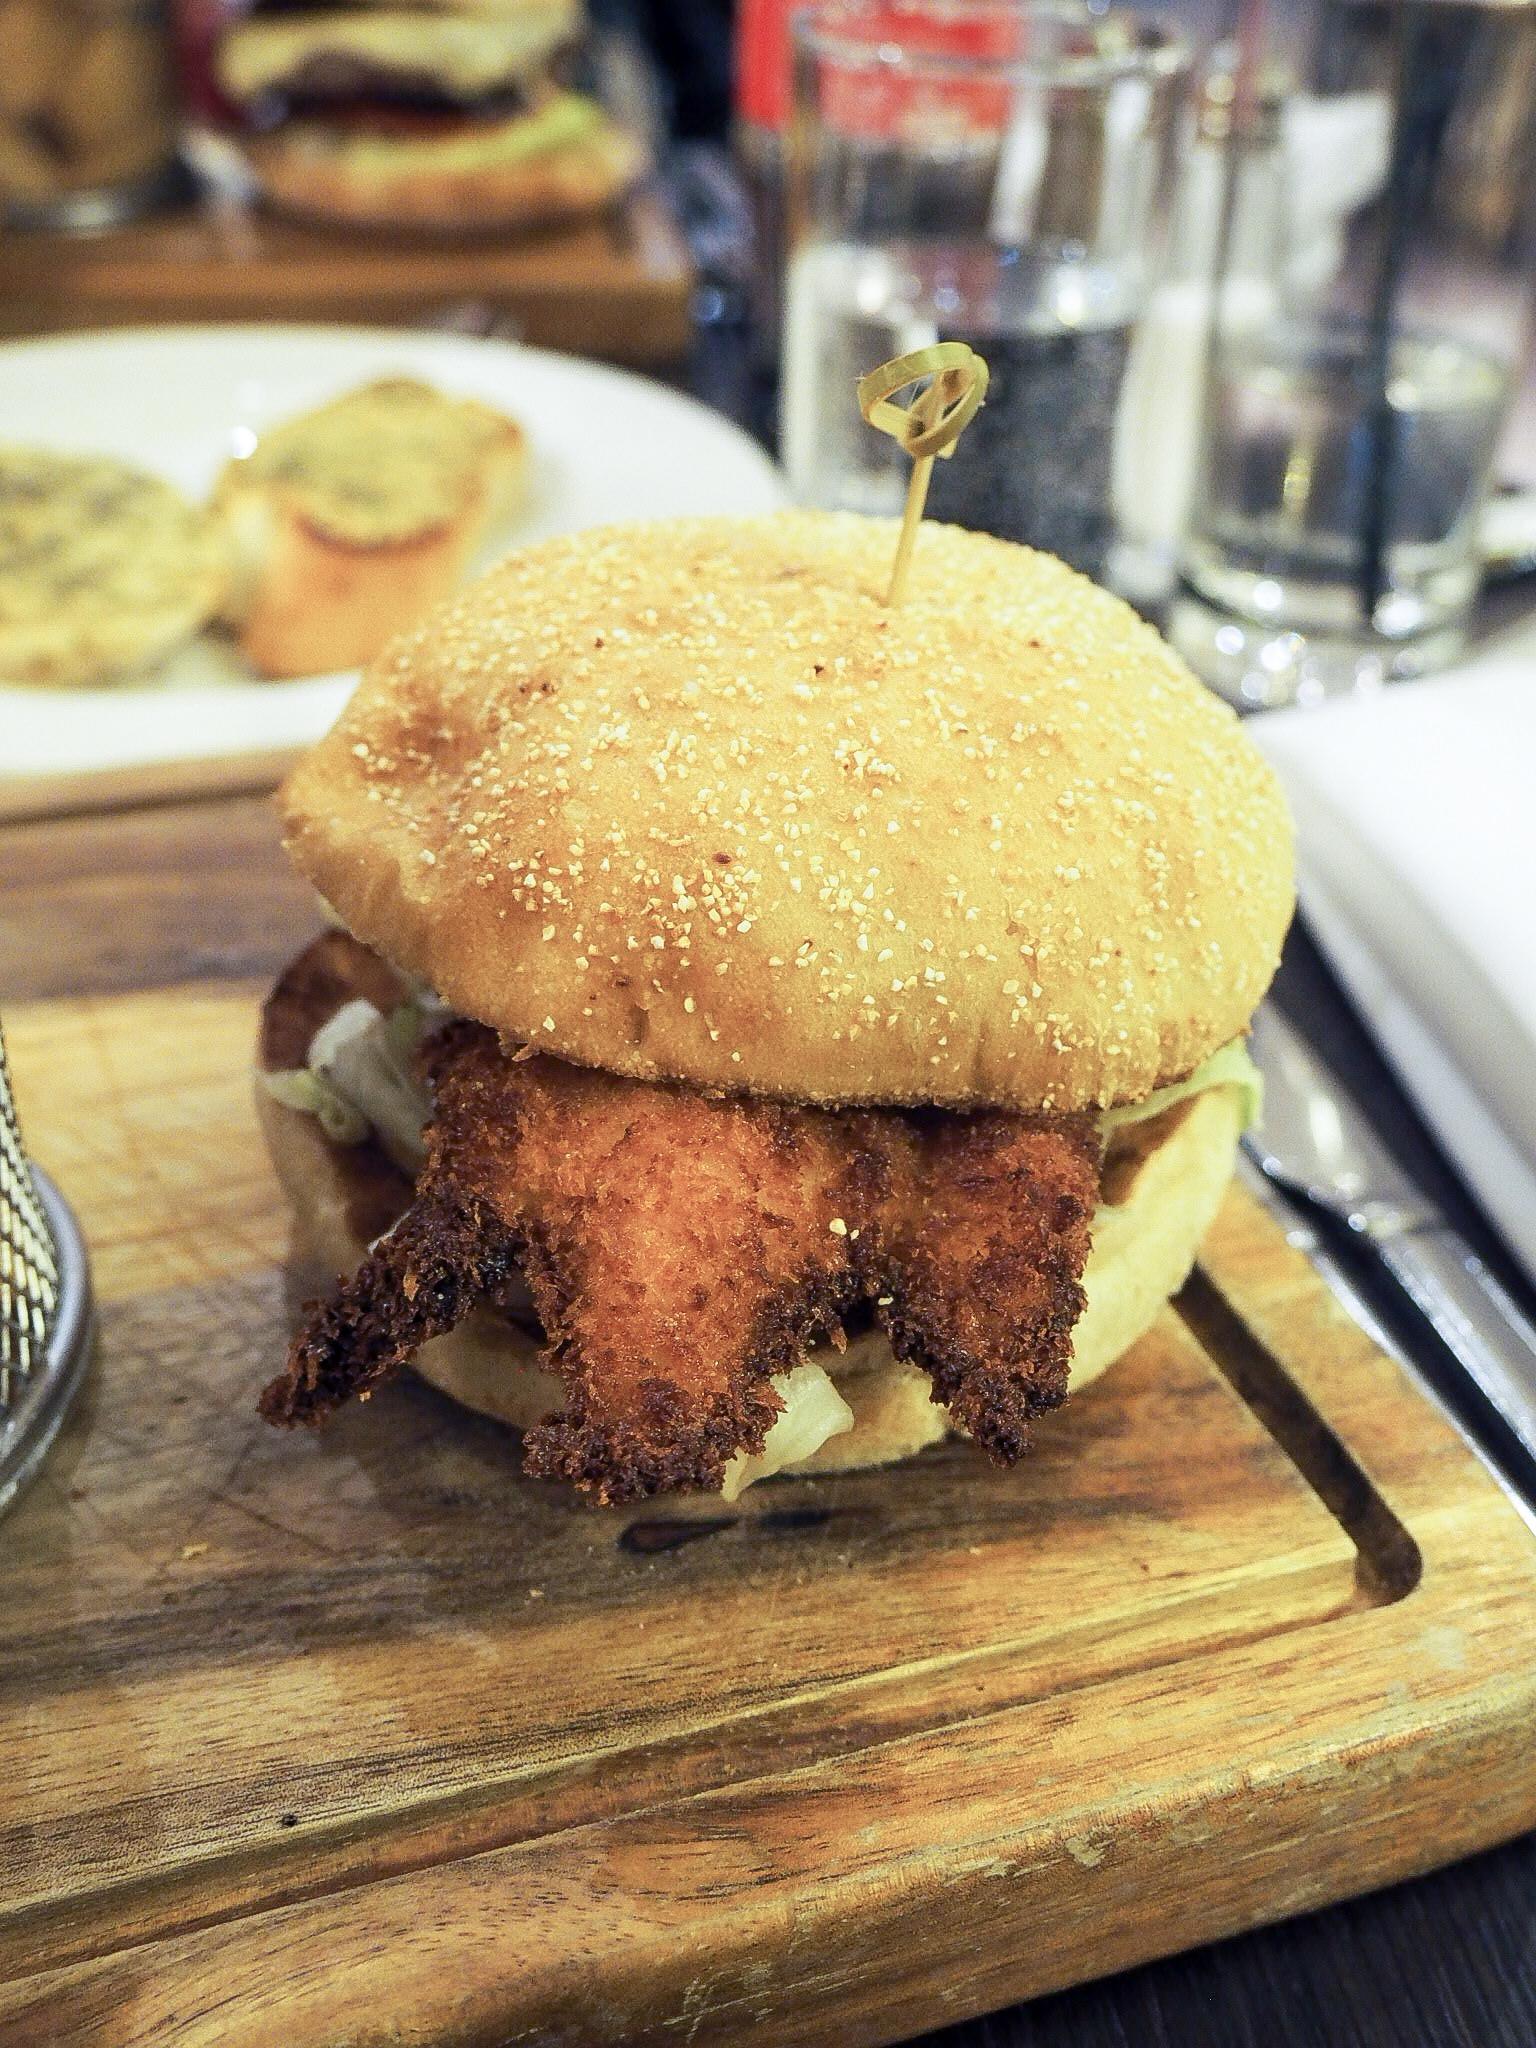 Crowne Plaza Resort Colchester katsu curry burger